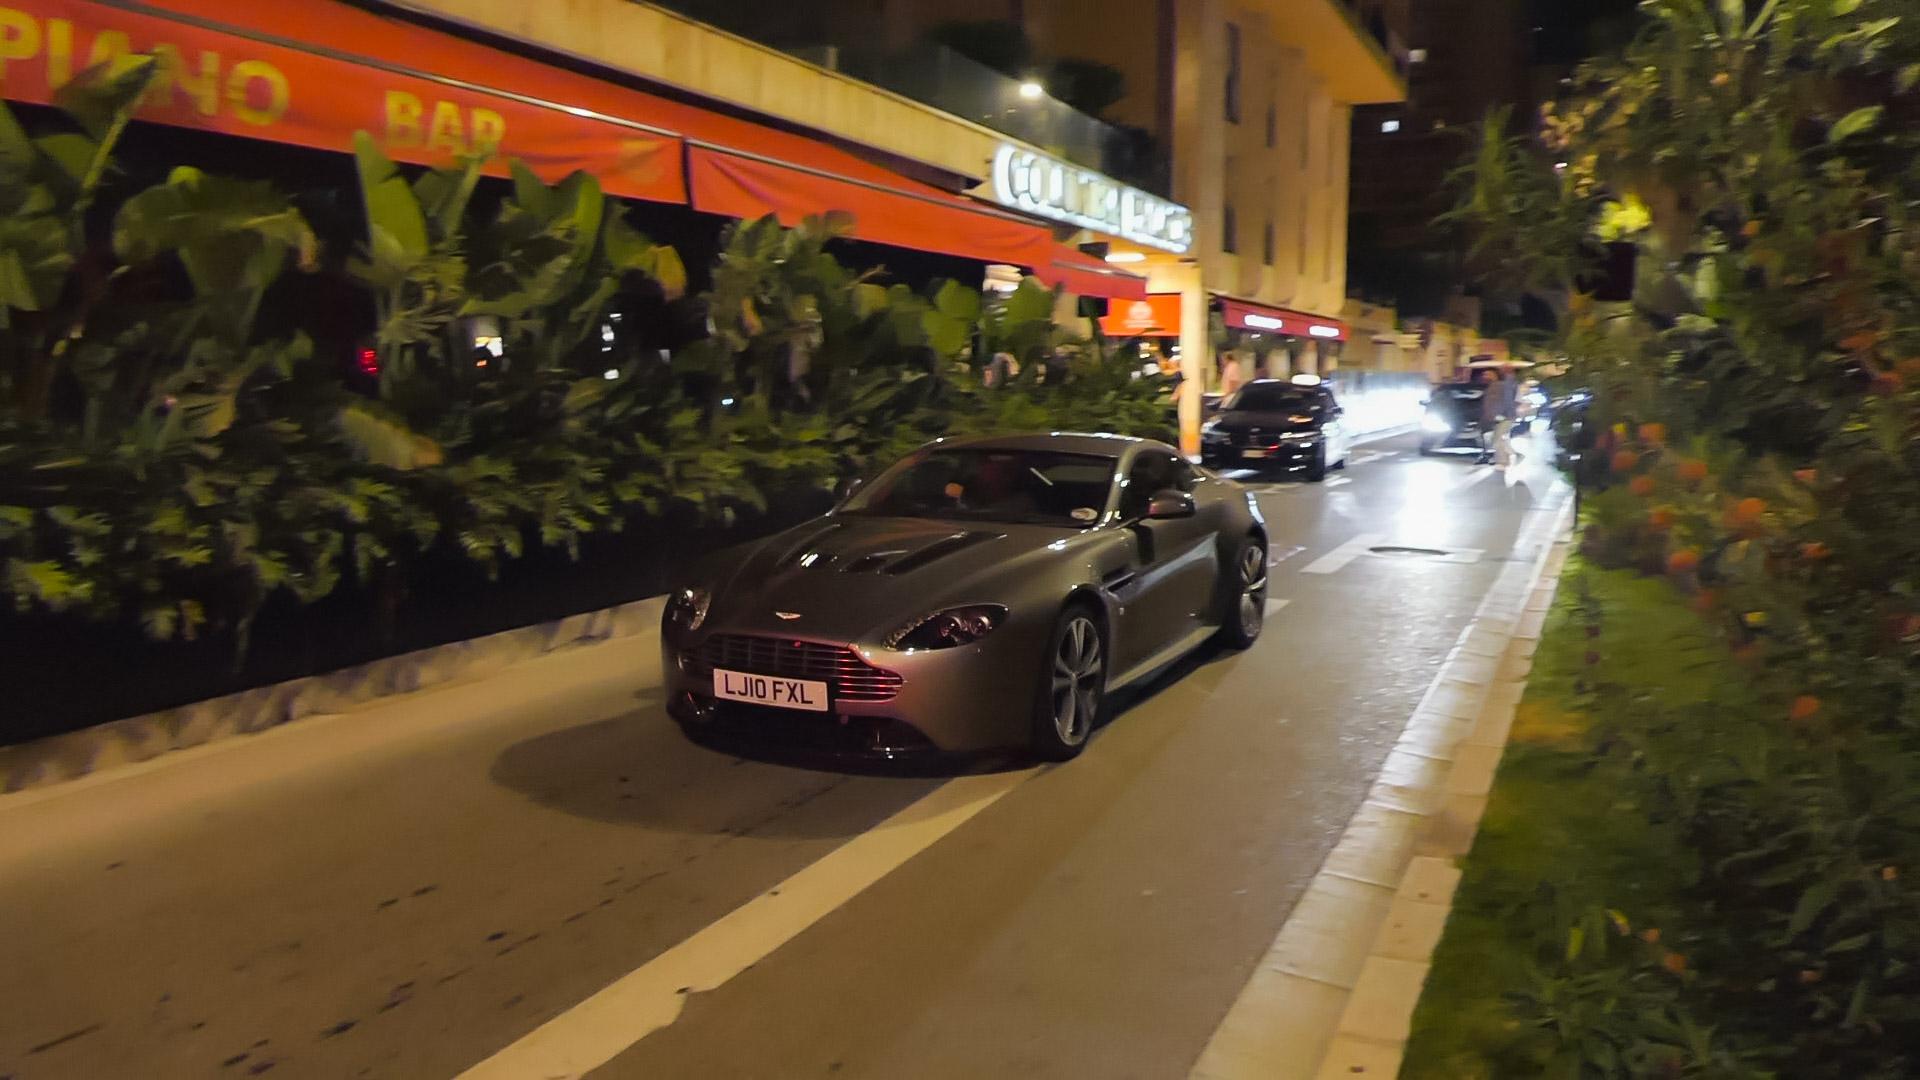 Aston Martin Vantage V12 - LJ10-FXL (GB)